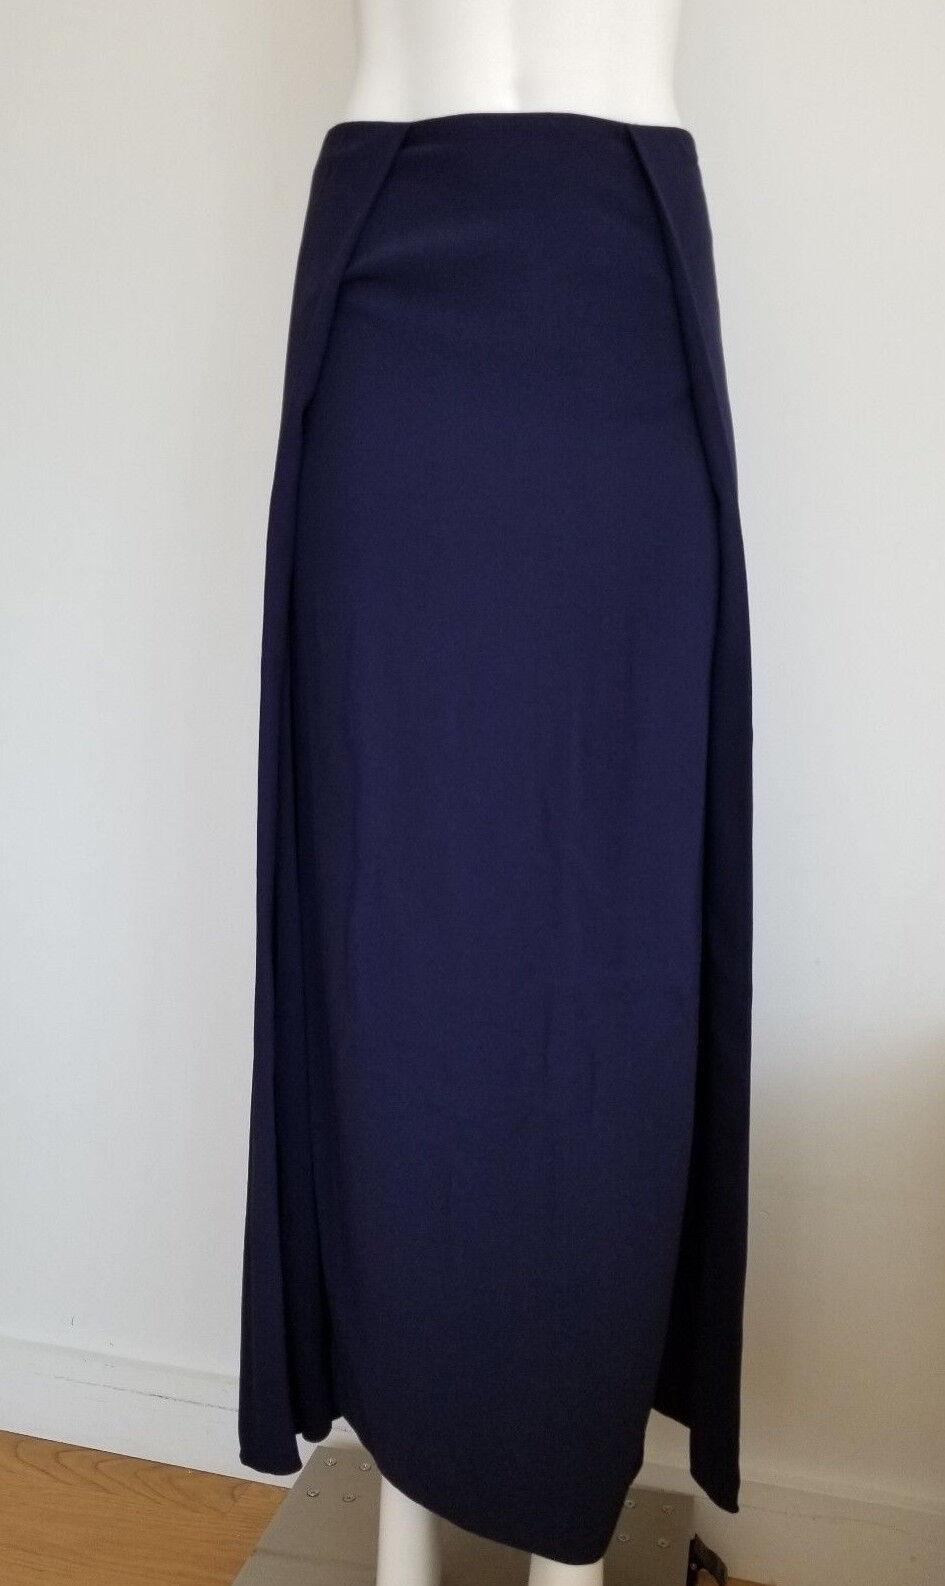 1.590  Ralph Lauren Purple Label Addison Straight Maxi Navy Skirt Size 2 XS